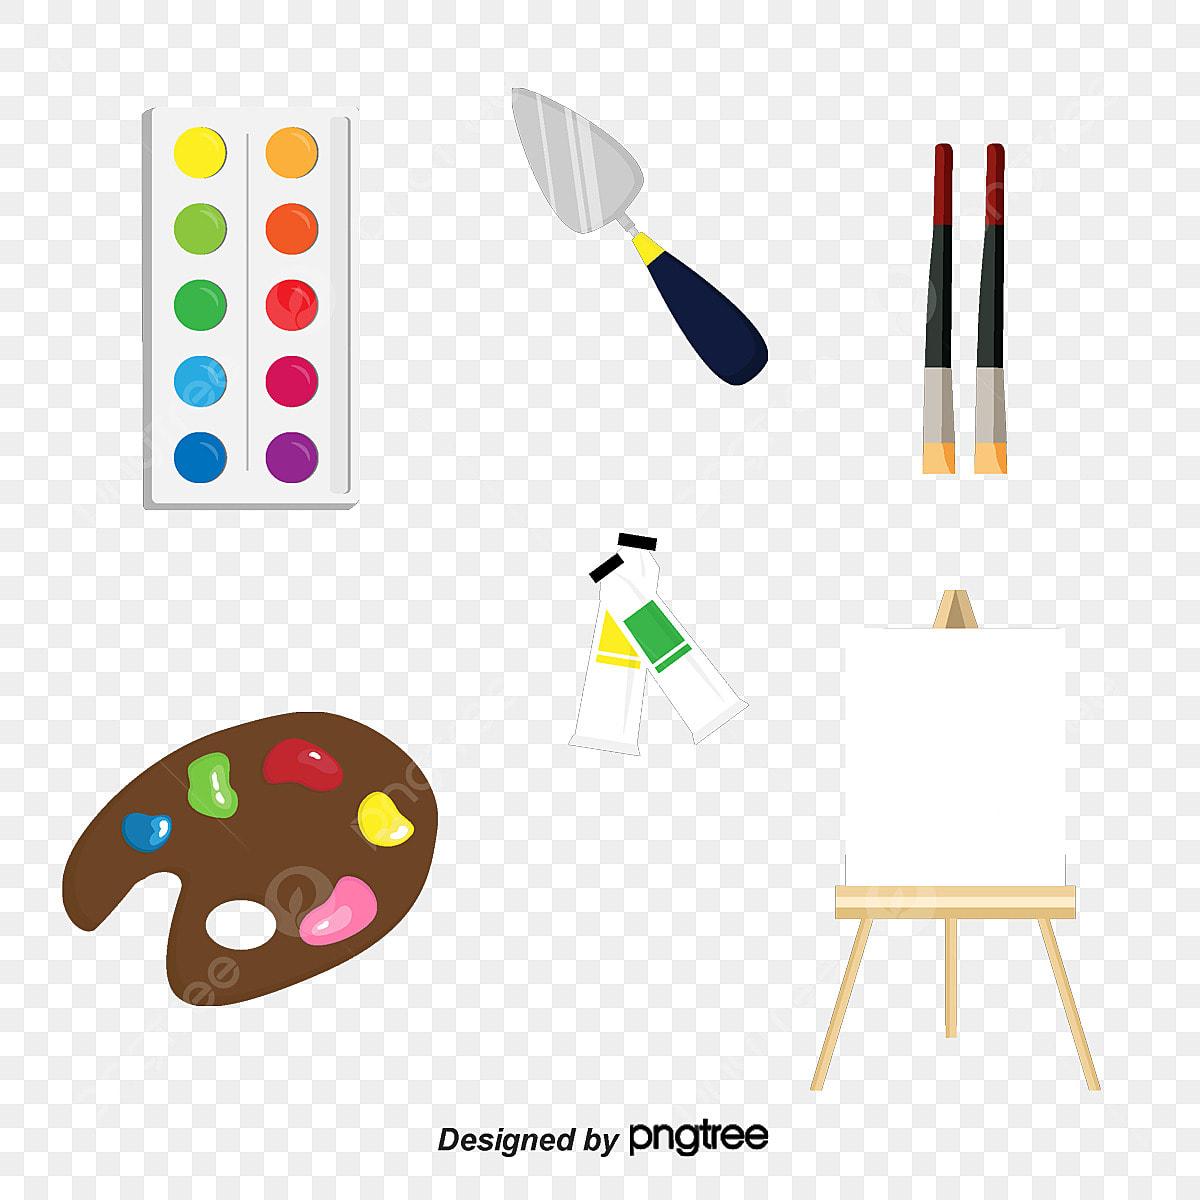 bcd414ca2 أدوات الرسم ناقلات أدوات الرسم أدوات الرسم فرشاة PNG والمتجهات ...